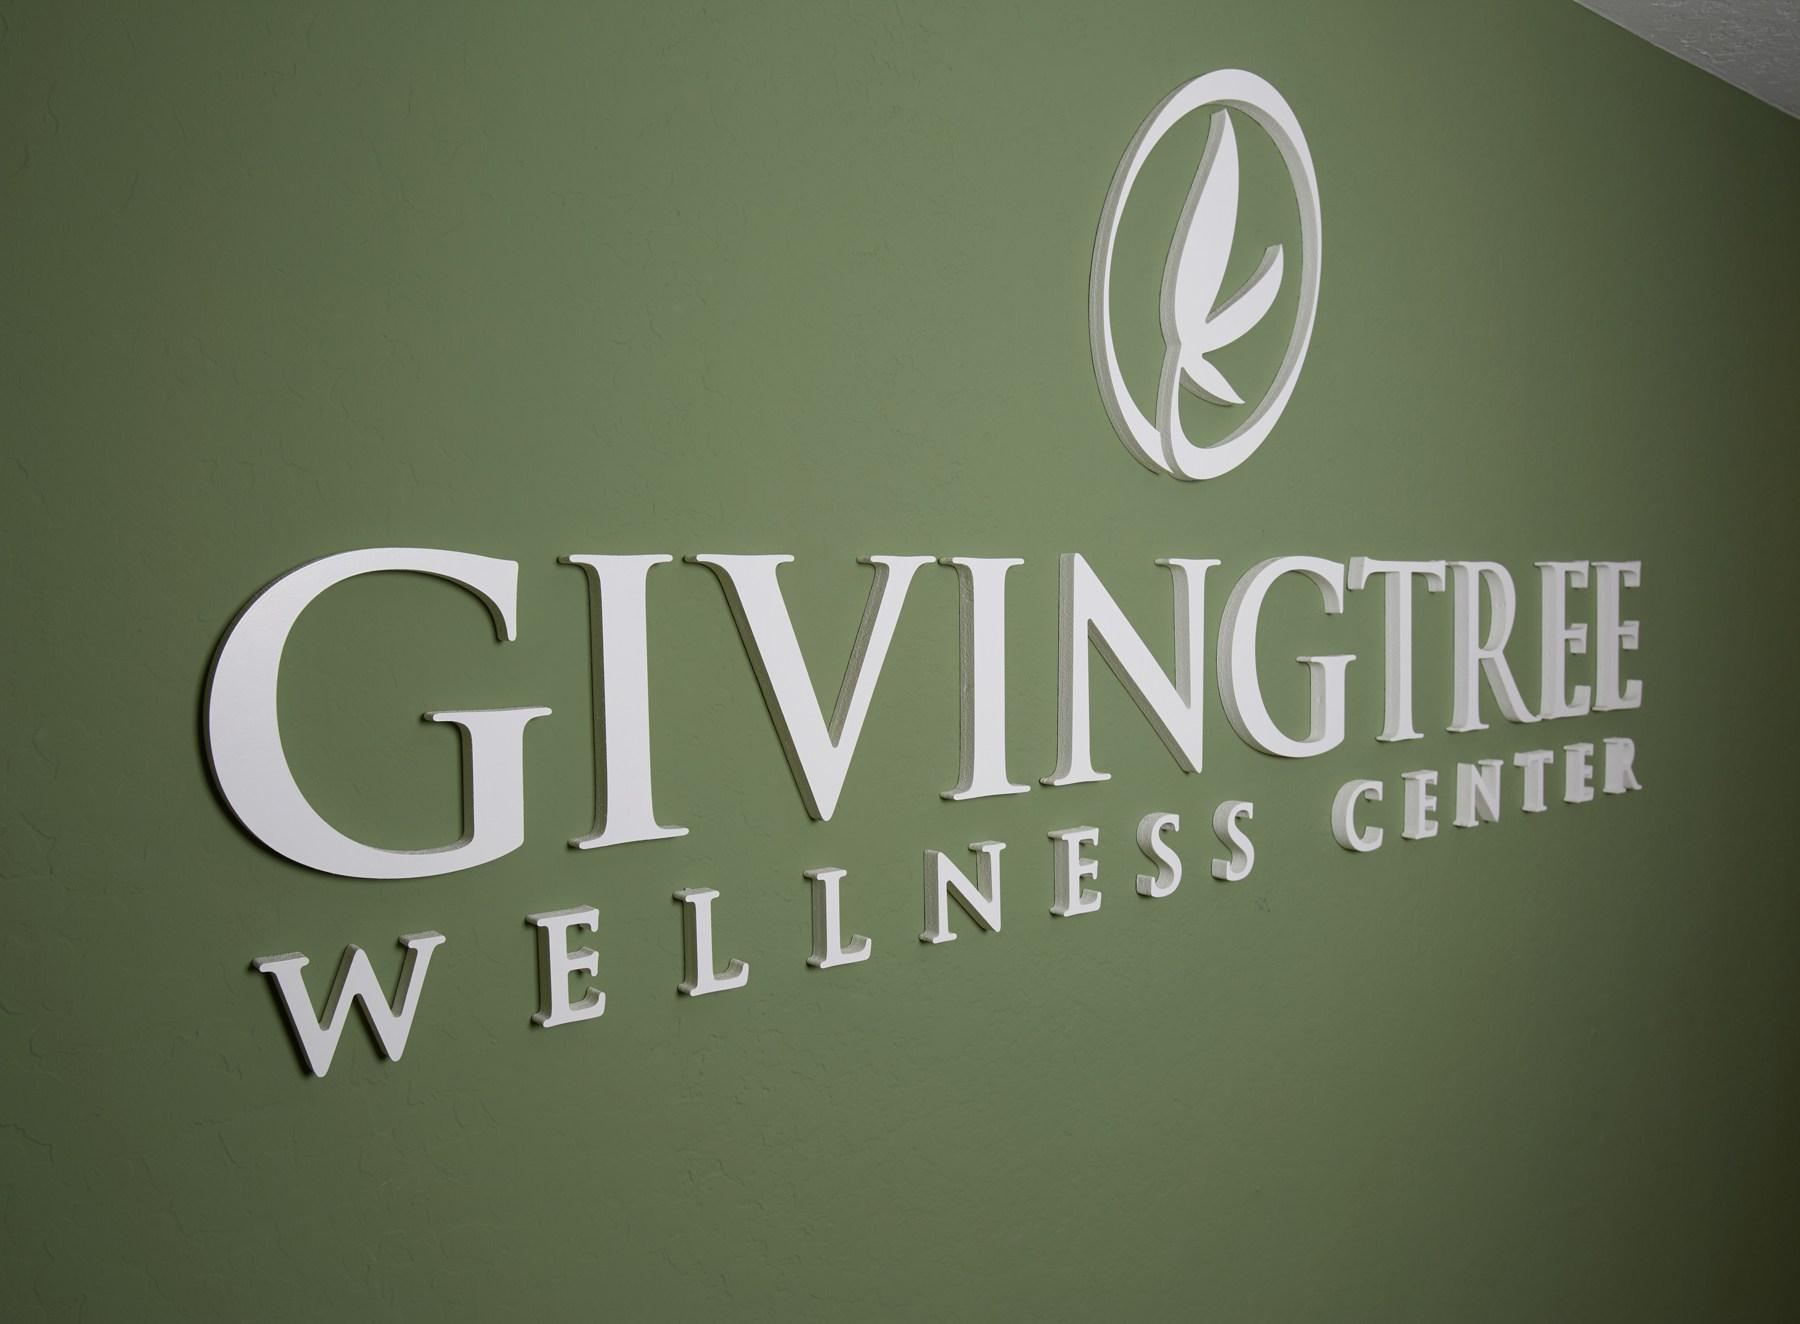 AZ-EV-Giving-Tree-Reception-Branding.jpg